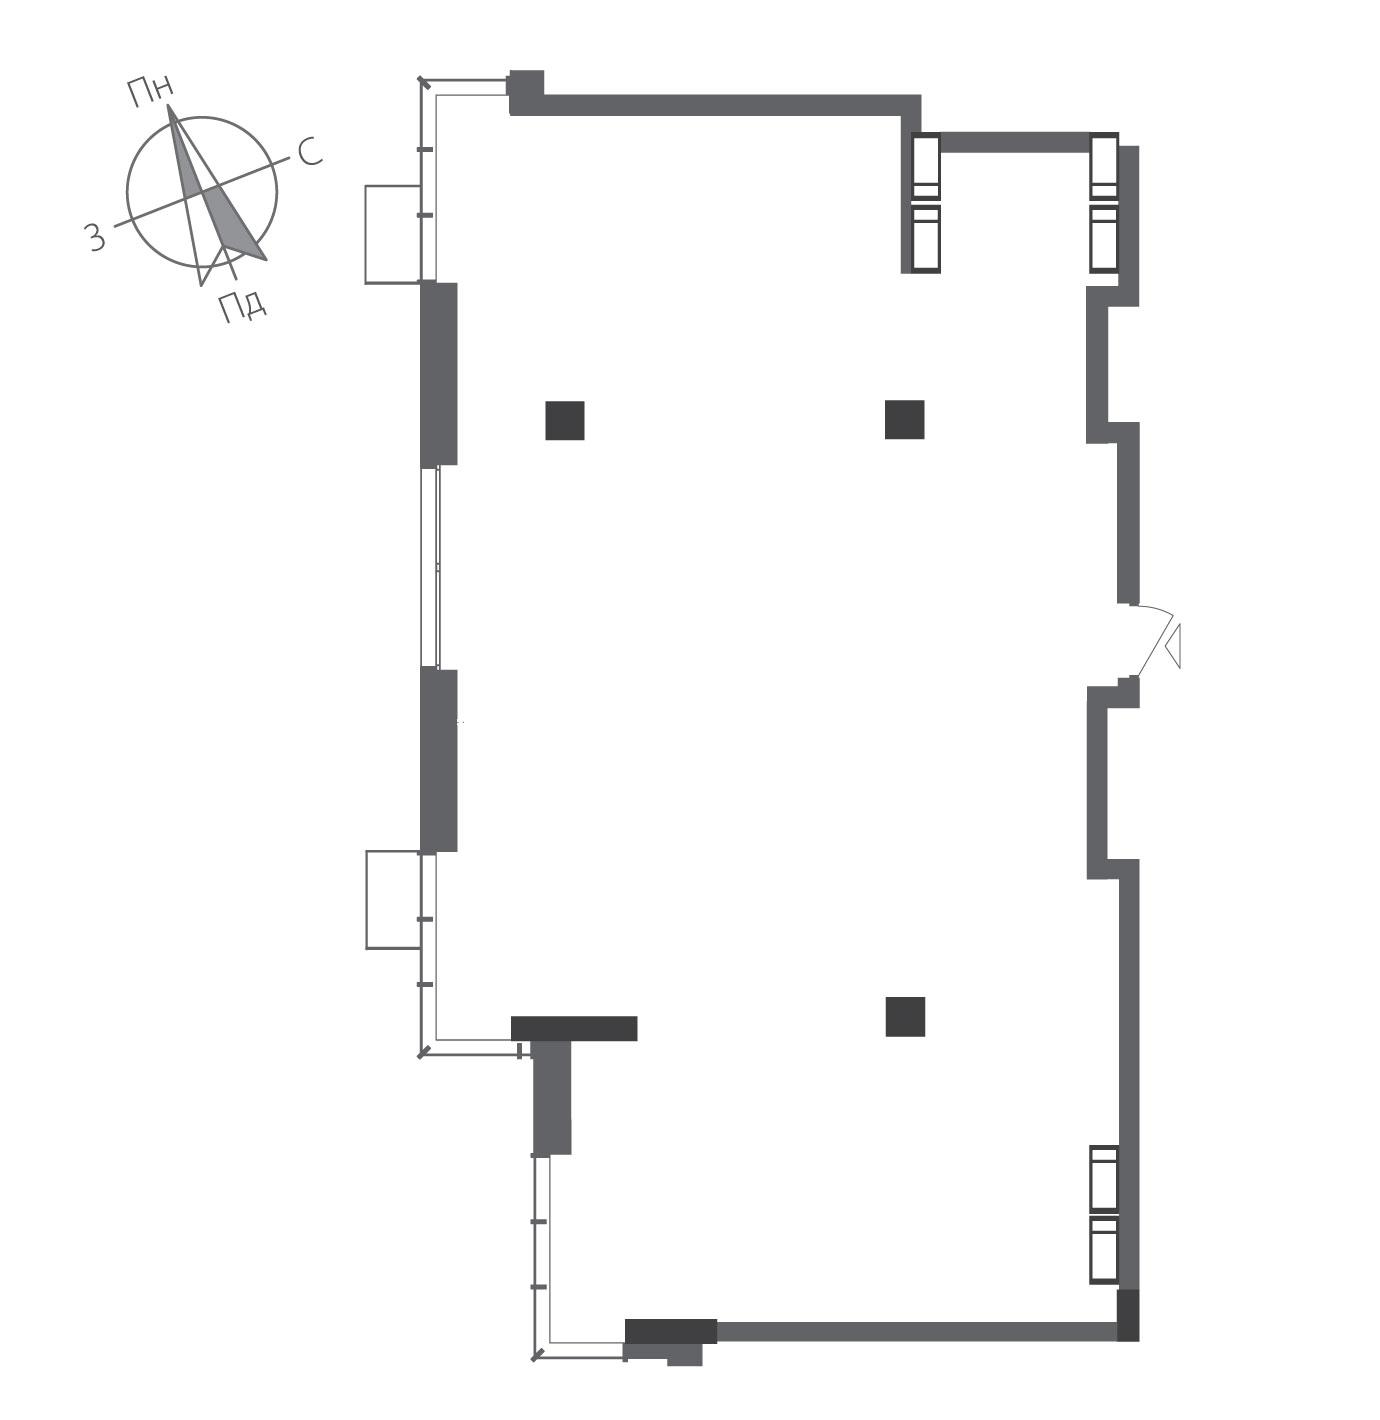 Трикімнатна квартира в ЖК RiverStone Номер квартири №18, Будинок 8, Поверх 18, Повна площа 129,54